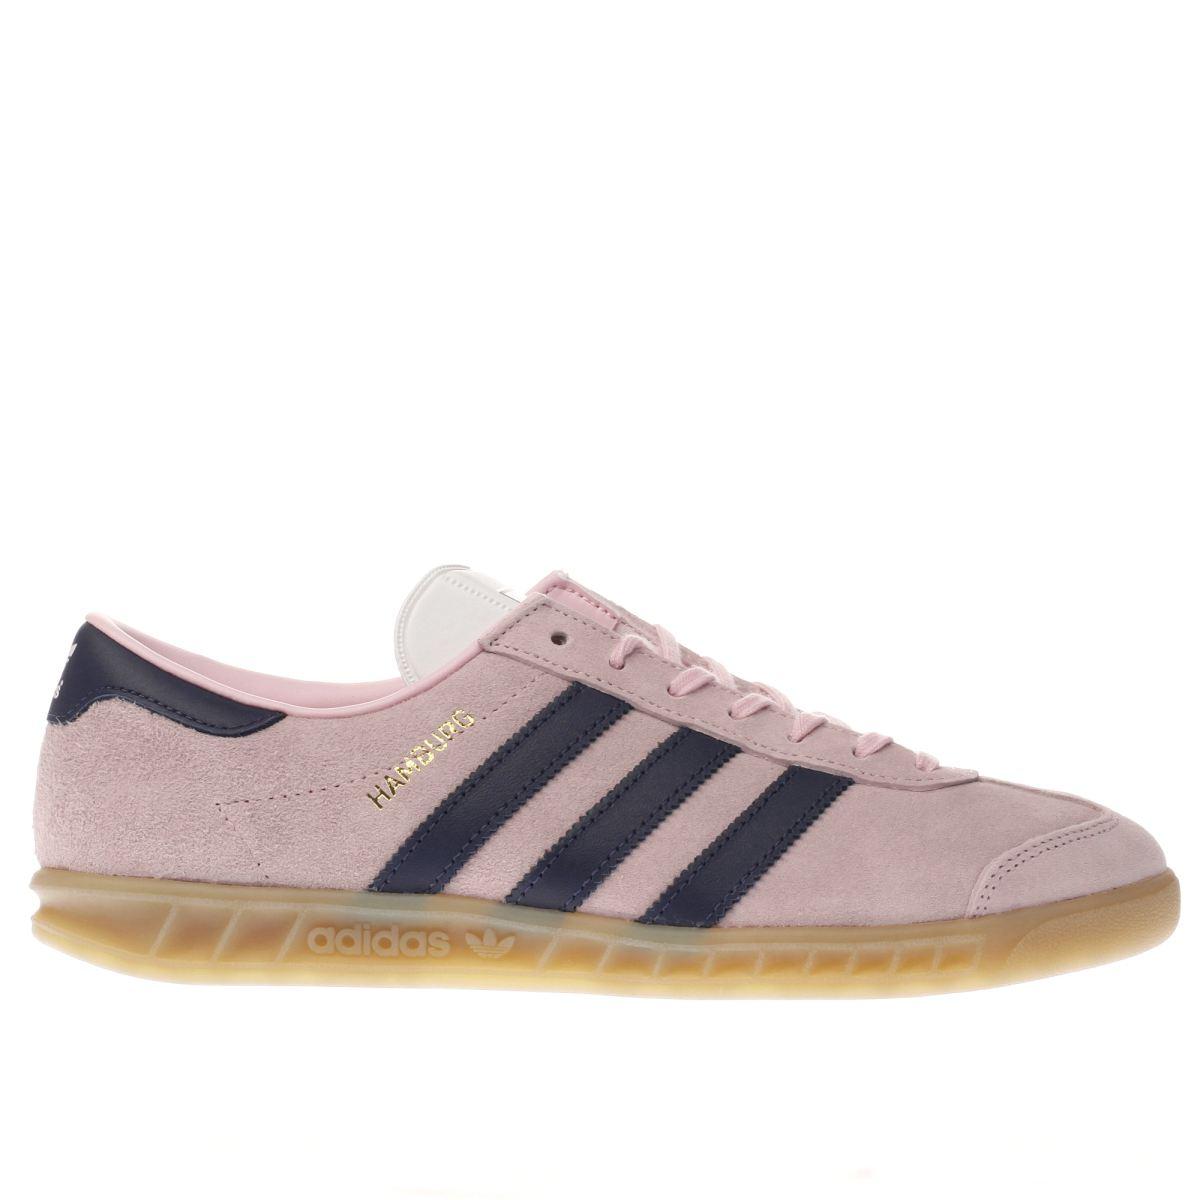 adidas pale pink hamburg trainers